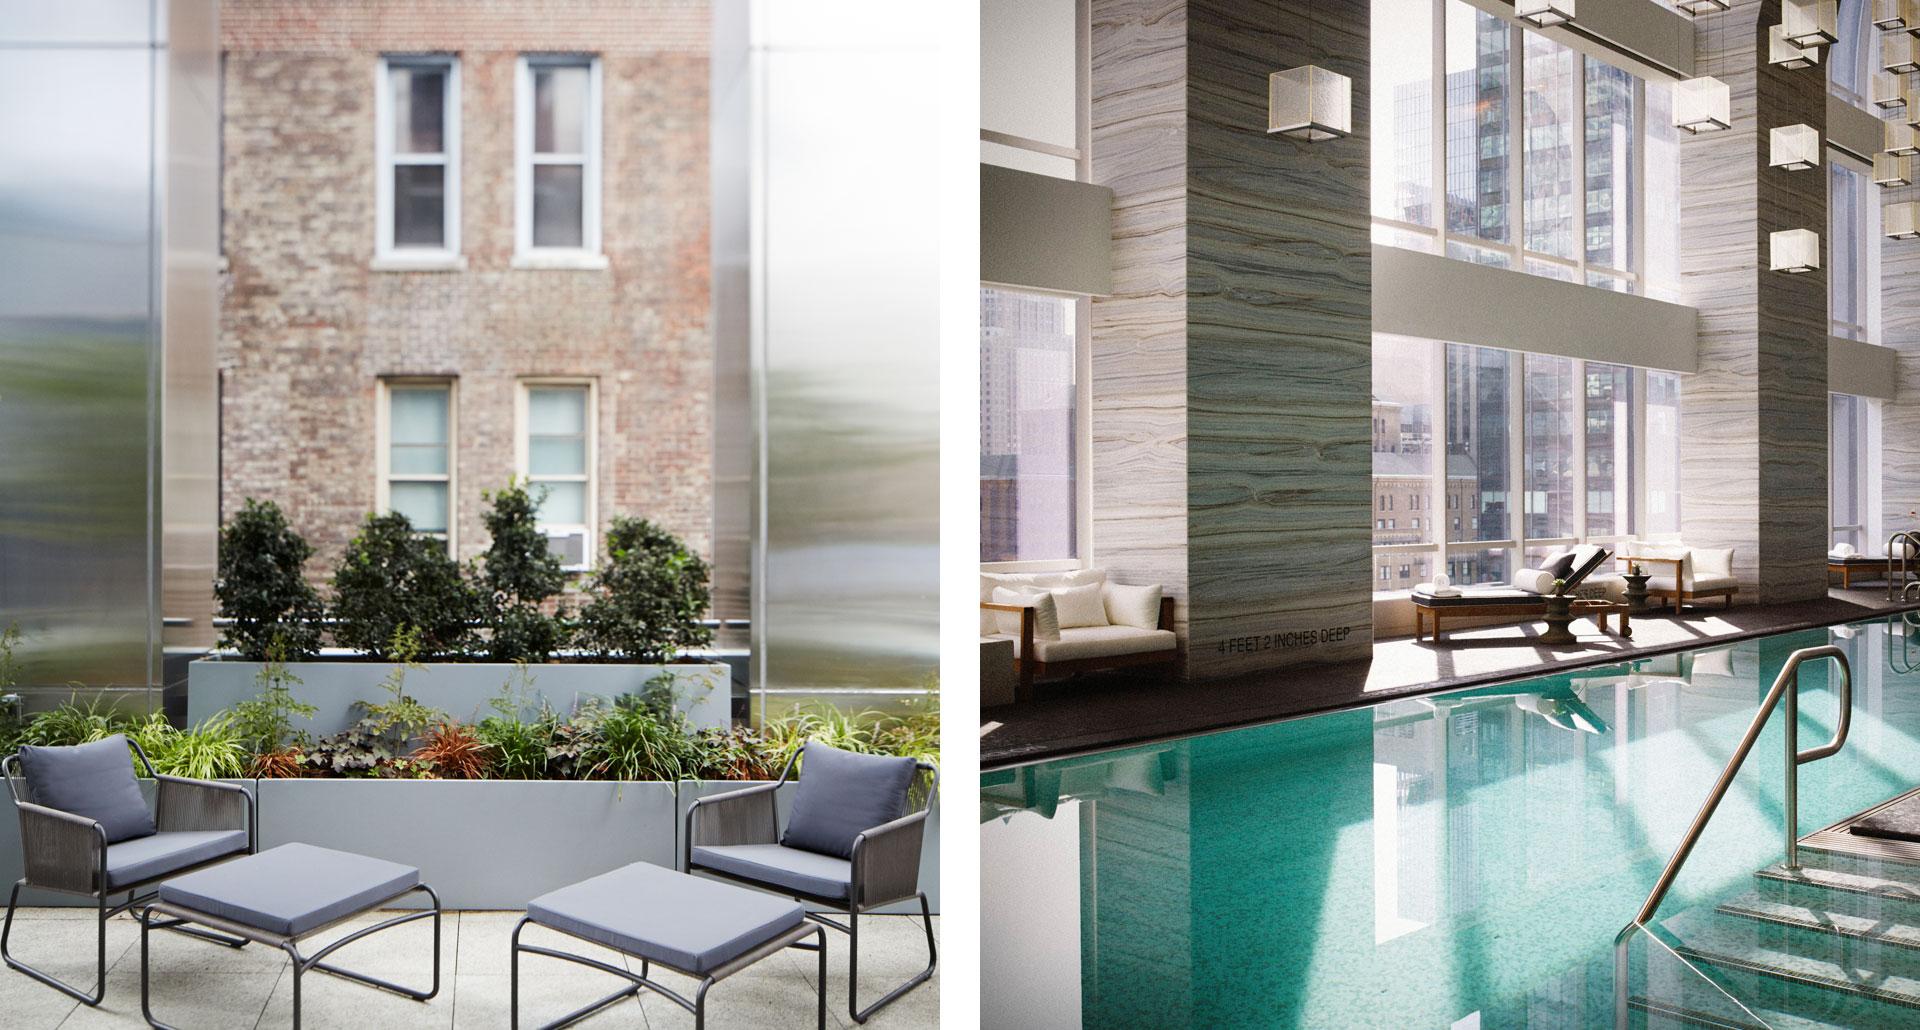 Park Hyatt New York - boutique hotel in NYC